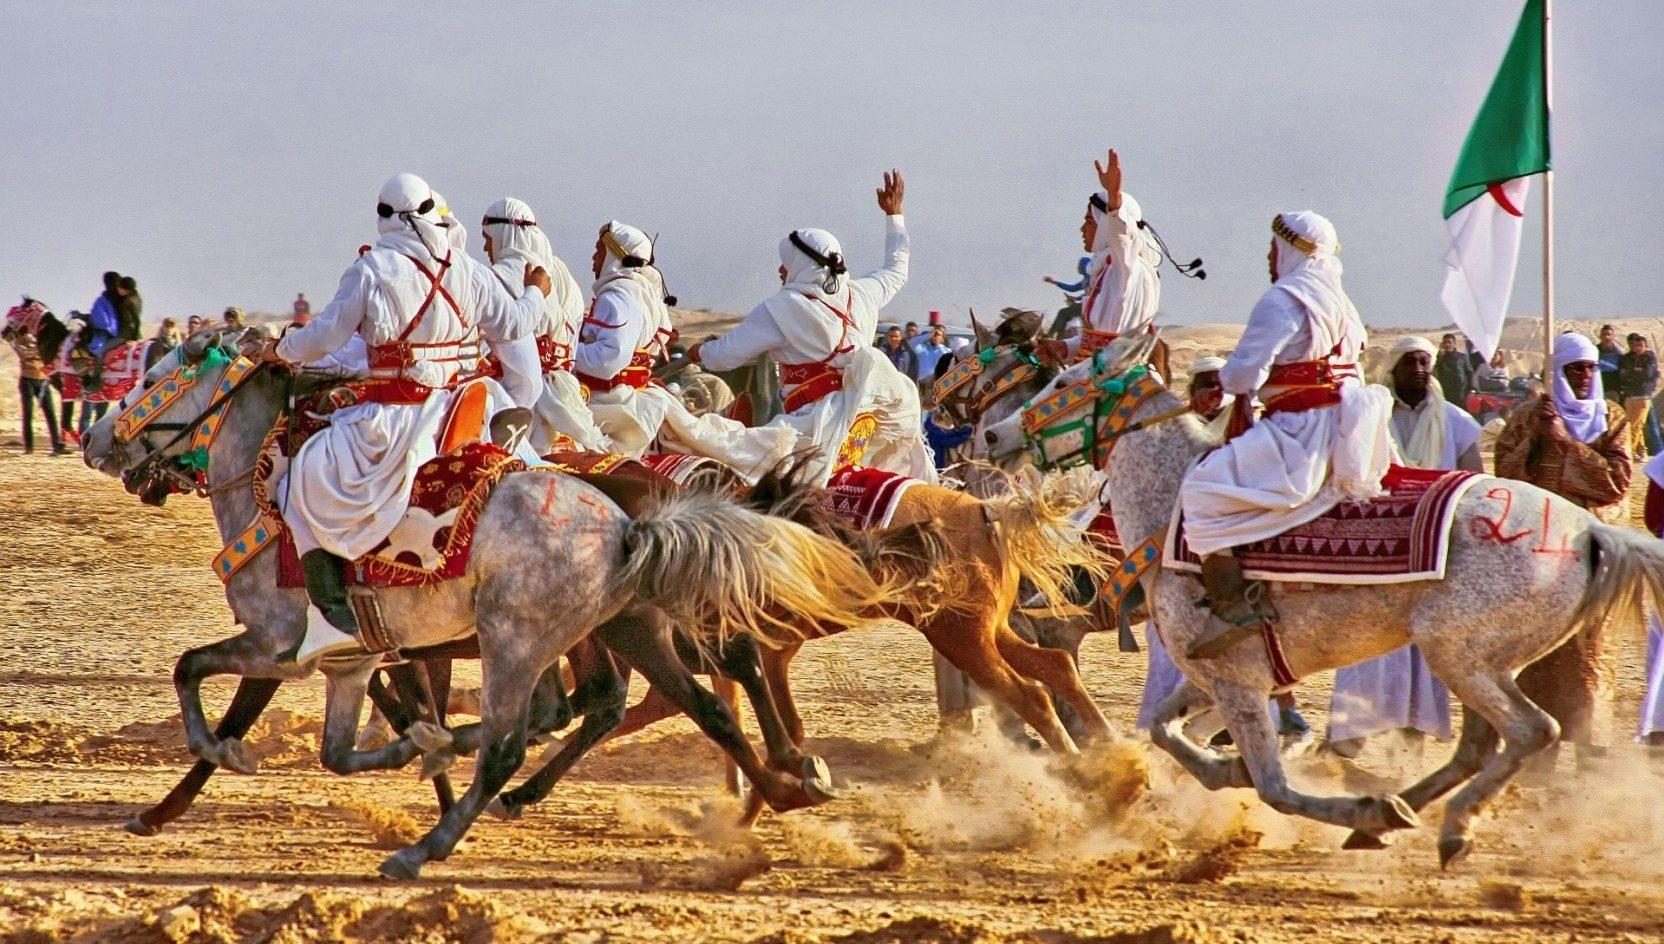 International Festival of the Sahara - Dan Jaeger Vendruscolo - Globetrotting horse riding holidays